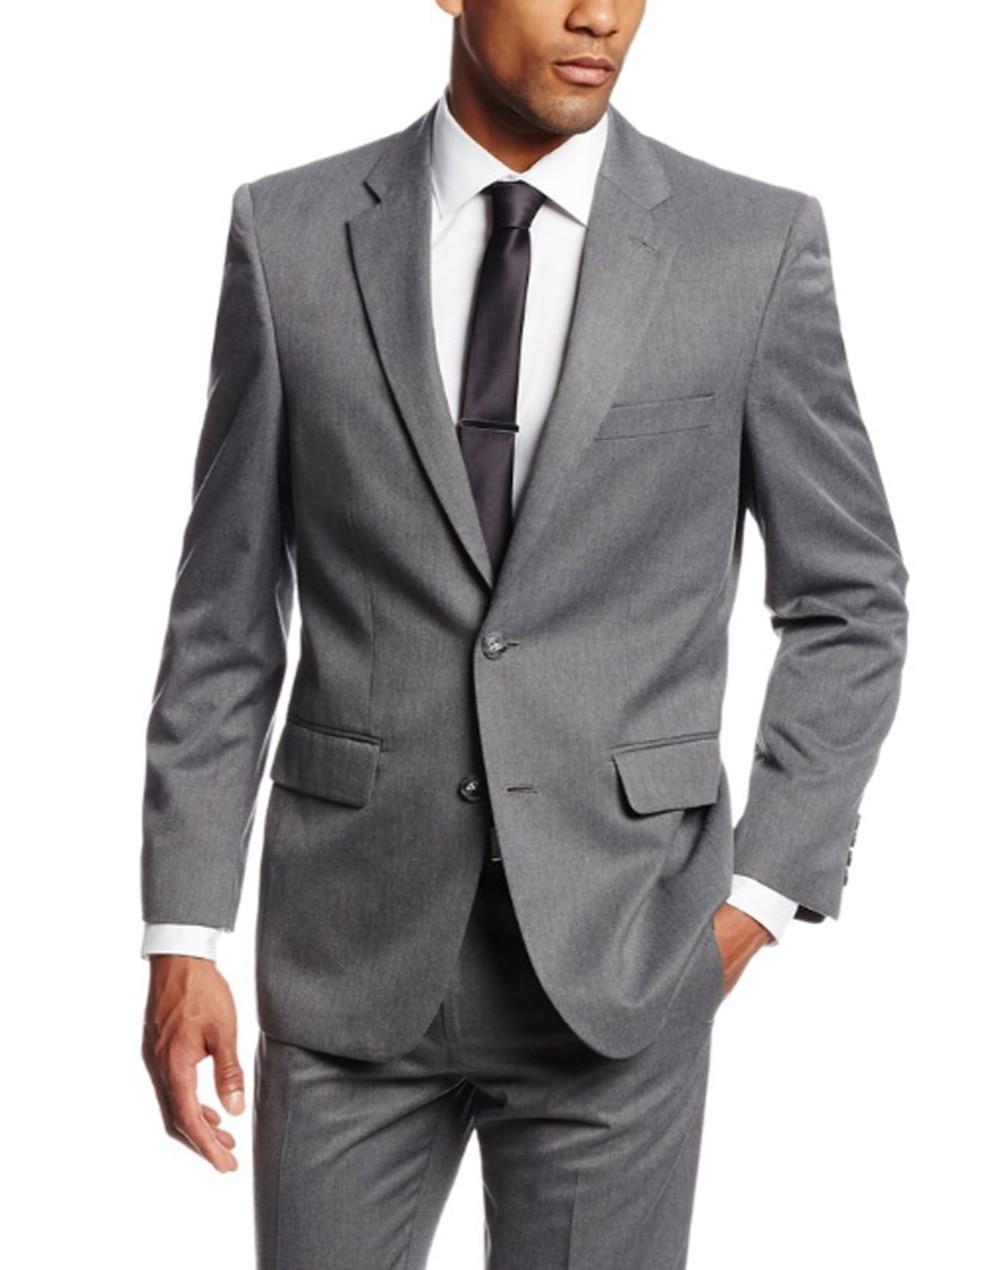 2017 Simple Suits Men Gray Wedding Suits Grooms Tuxedos Mens Suits Slim Fit Beach Groomsmen Suits (Jacket+Pant+ Tie)